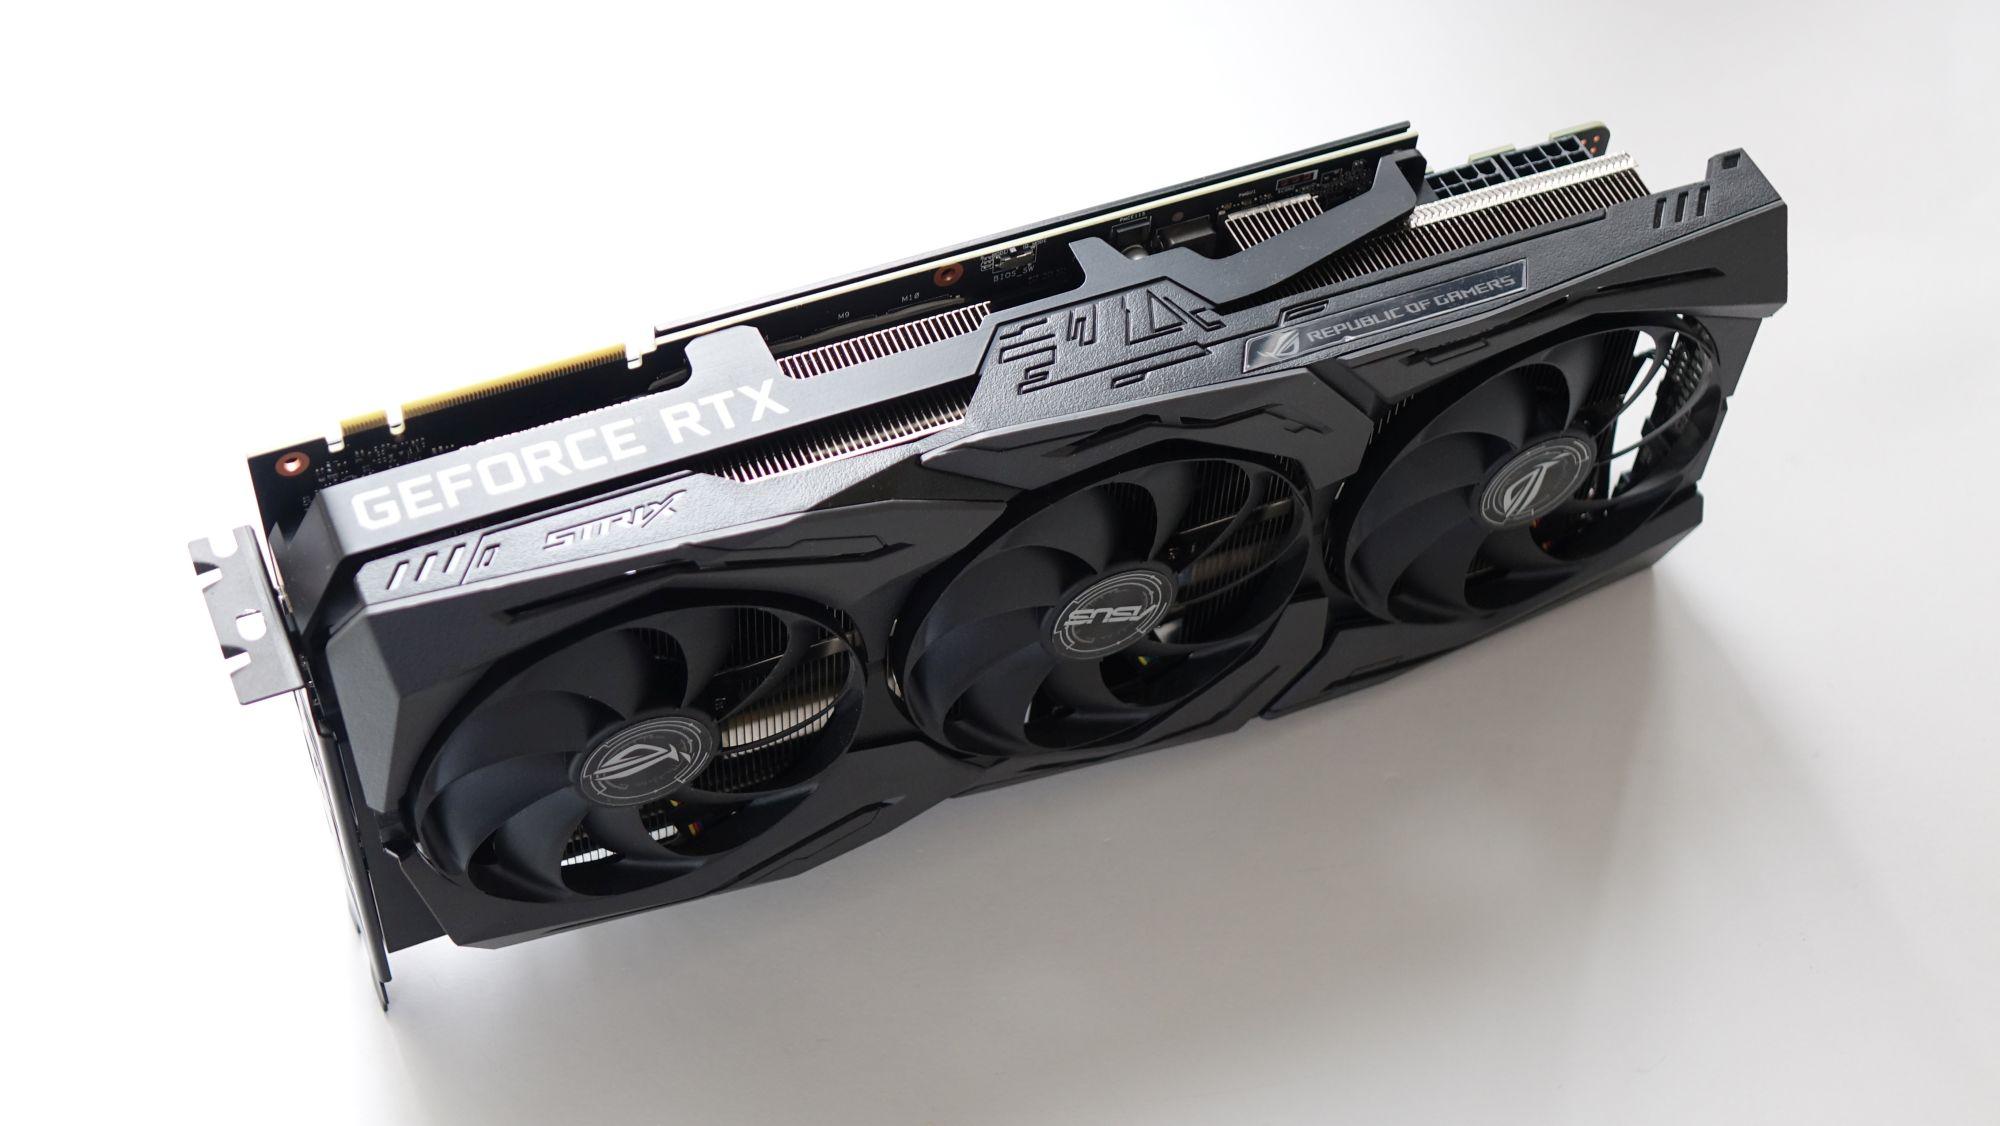 ASUS ROG Strix GeForce RTX 2080 Super hero